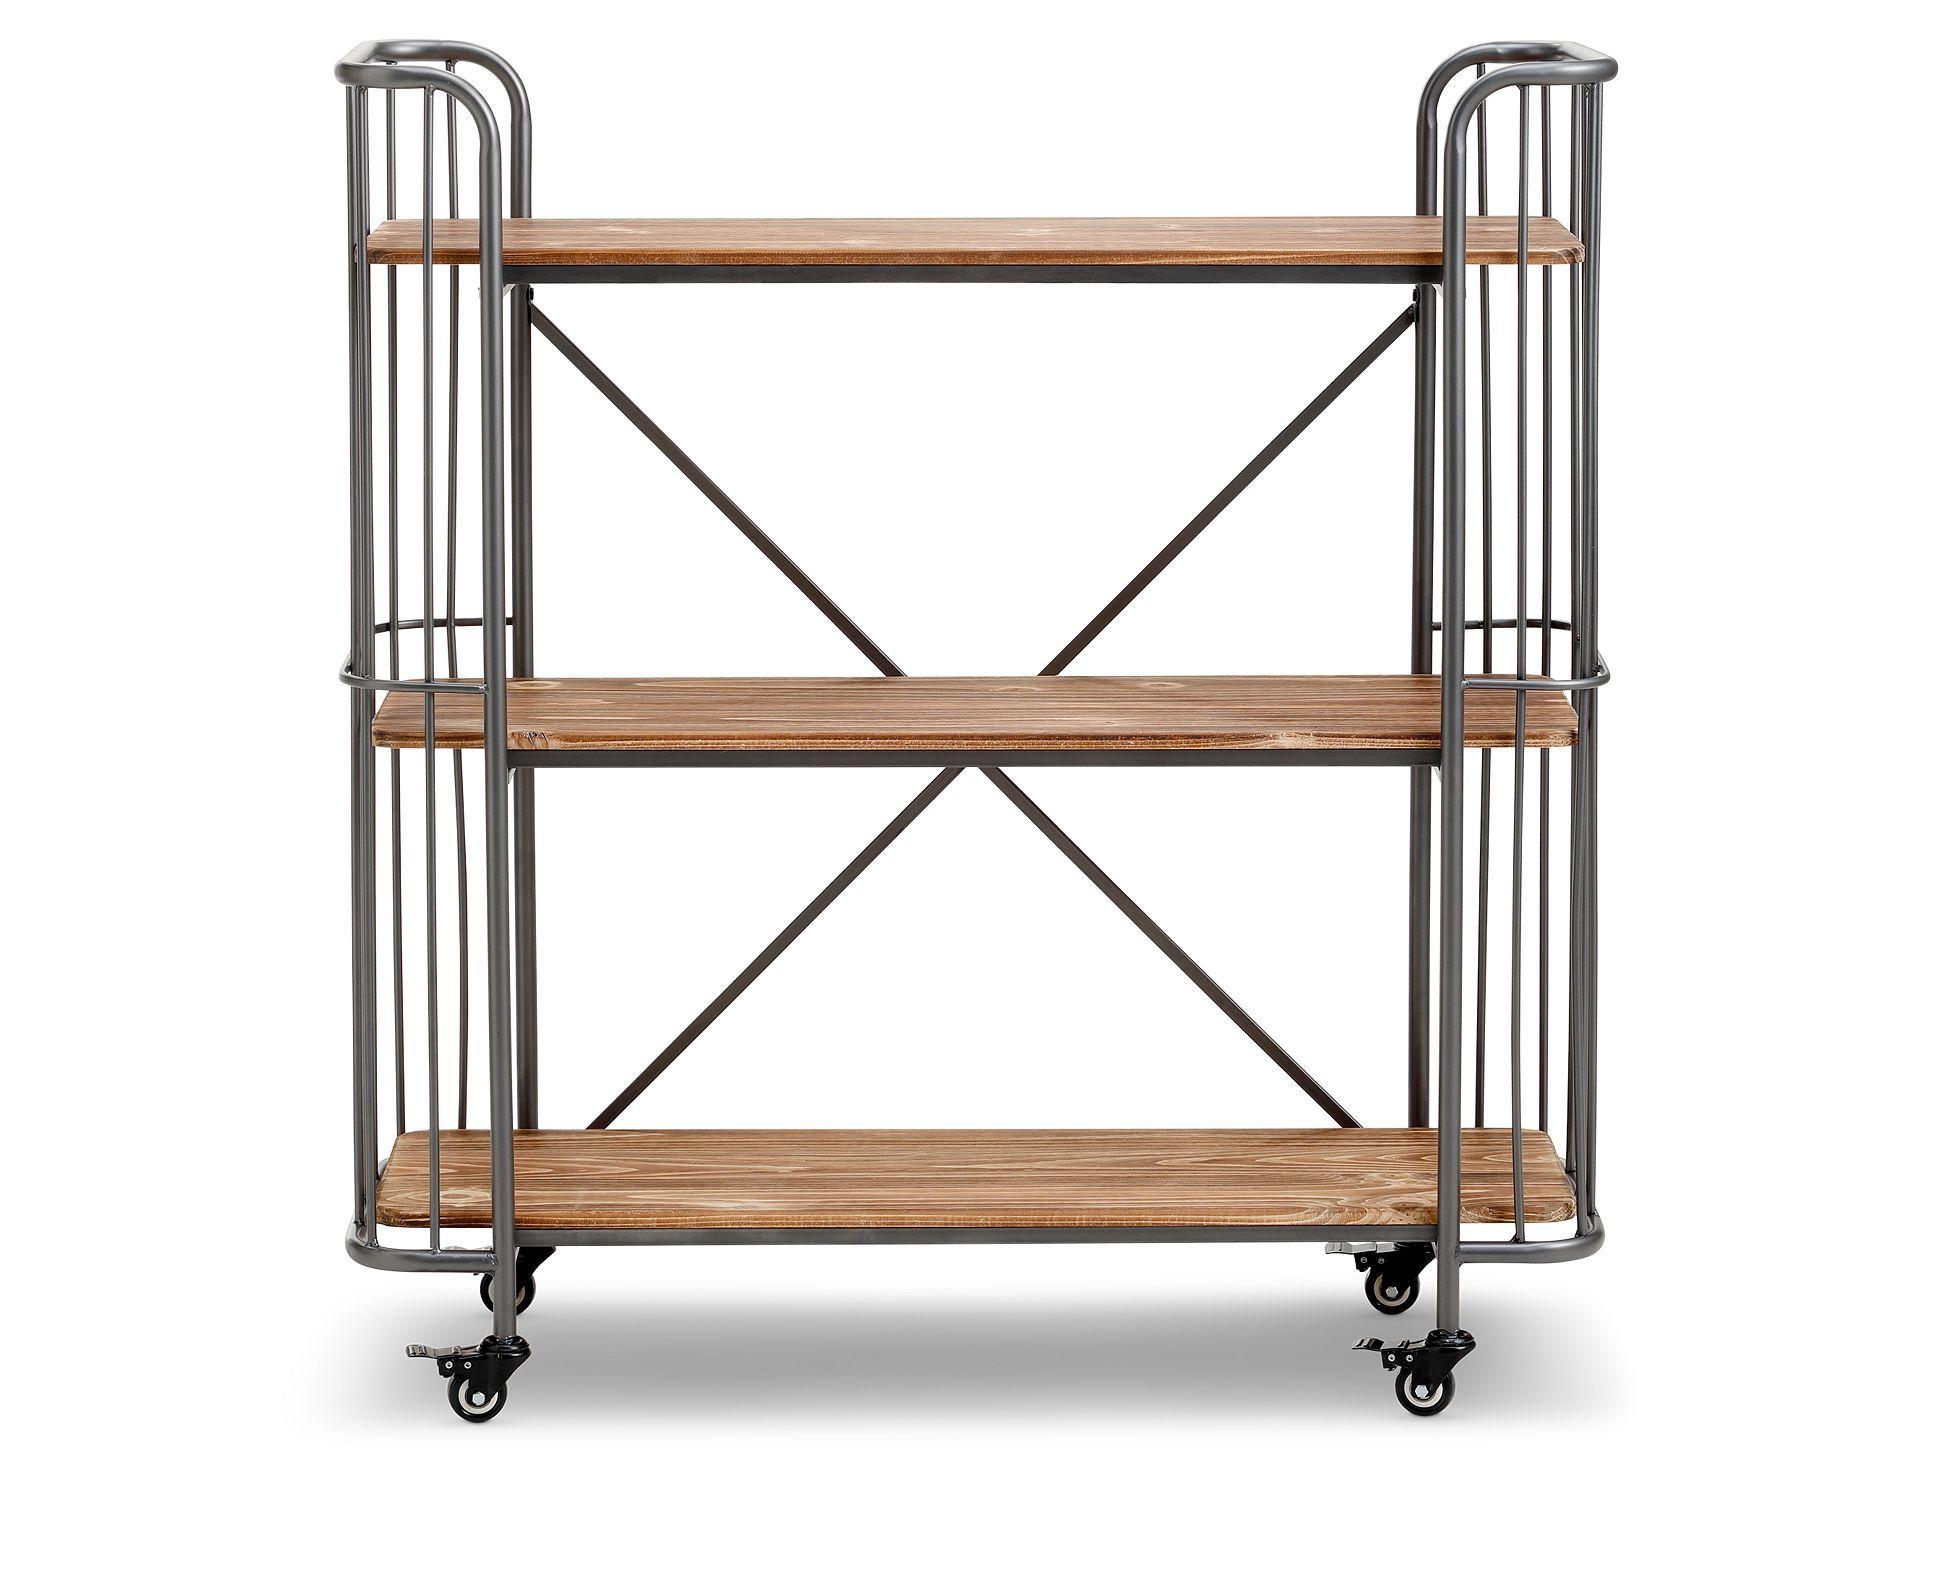 Benji 3 Tier Shelf Industrial Interiors Furniture Decor